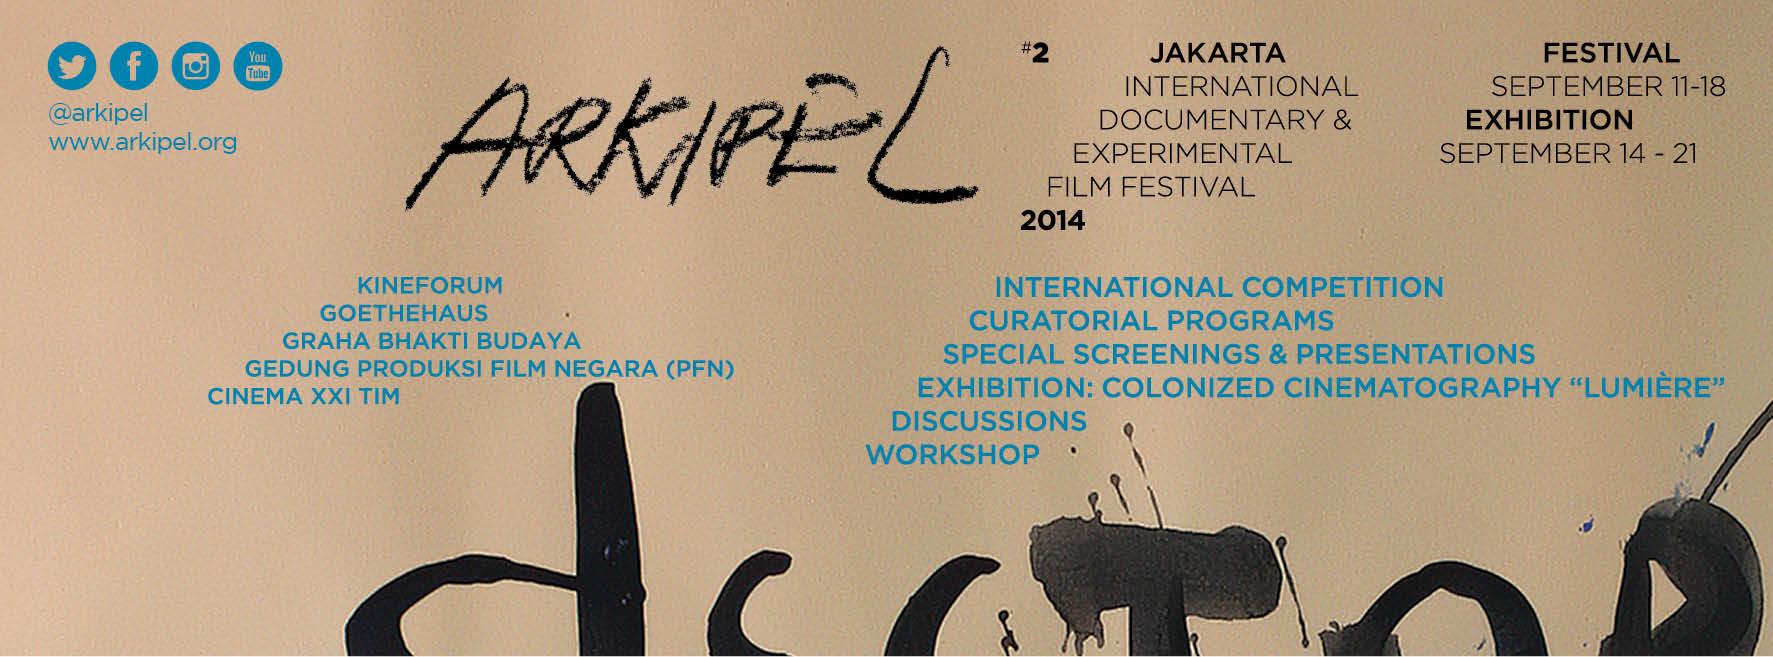 FA Facebook Cover ARKIPEL 2014